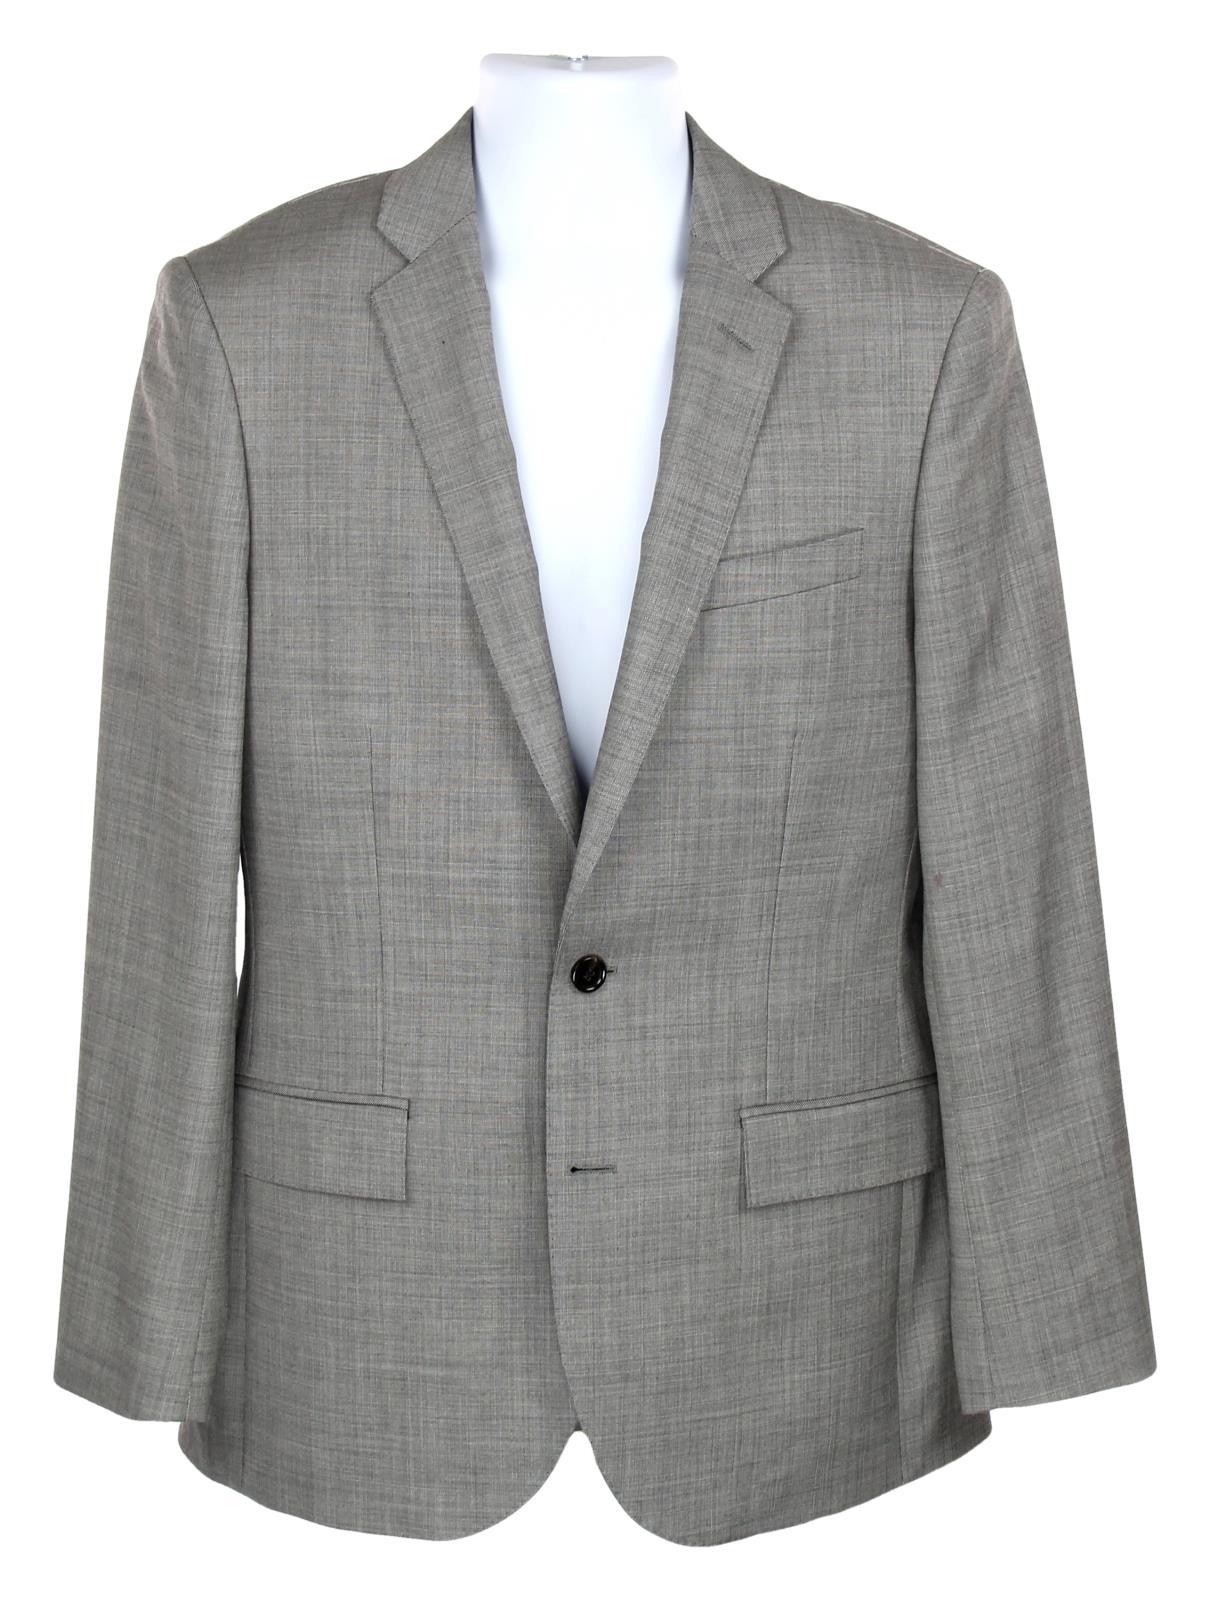 J CREW 38S Ludlow Slim Suit Jacket Italian Worsted Wool Mineral Grey G1109